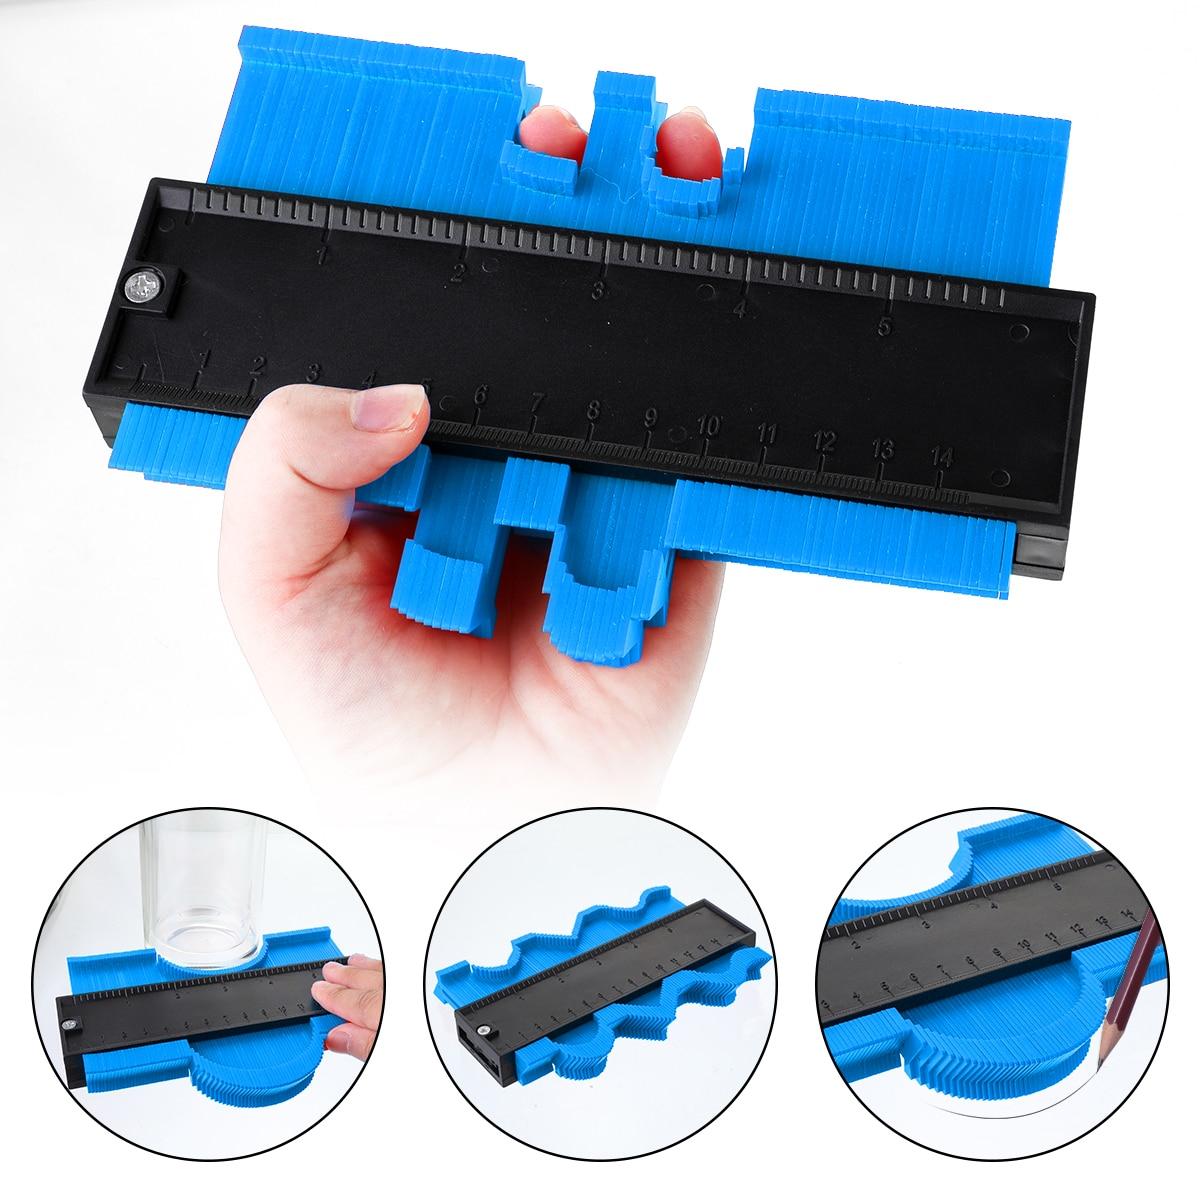 Measure Ruler 5/10 inch Multi-functio Contour Profile Gauge Tiling Laminate Tiles Edge Shaping Wood ABS Contour Gauge Duplicator thumbnail